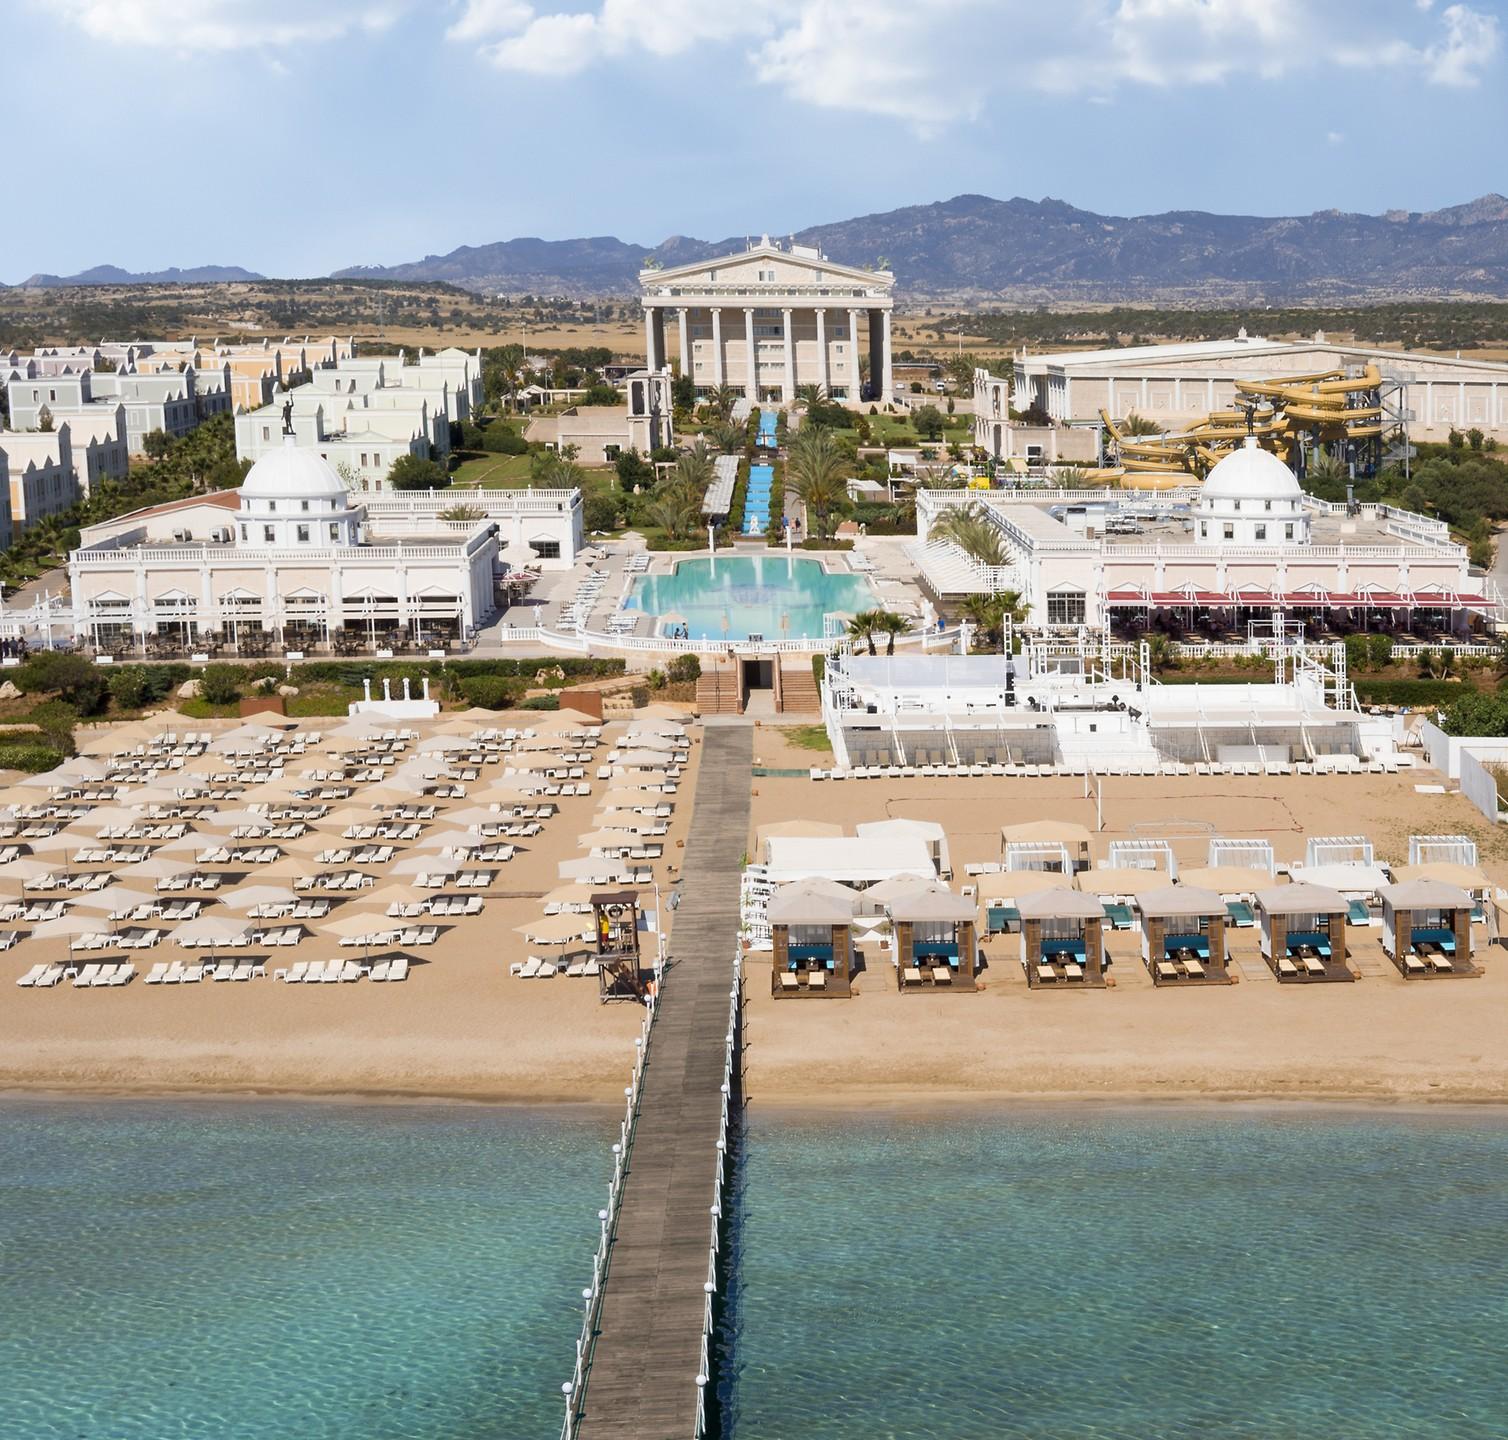 Kaya Artemis Resort & Casino